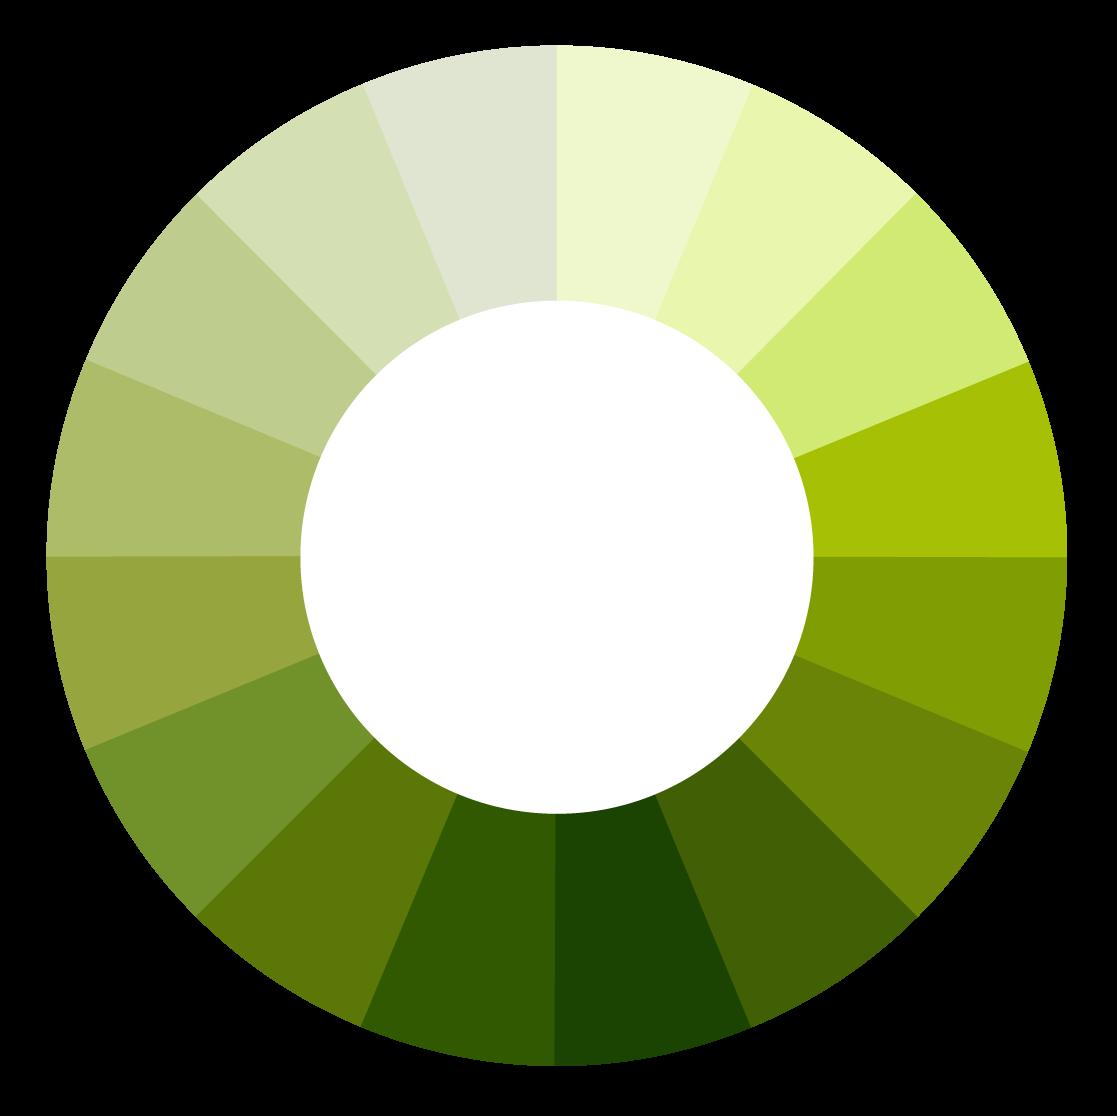 Green Color Wheel